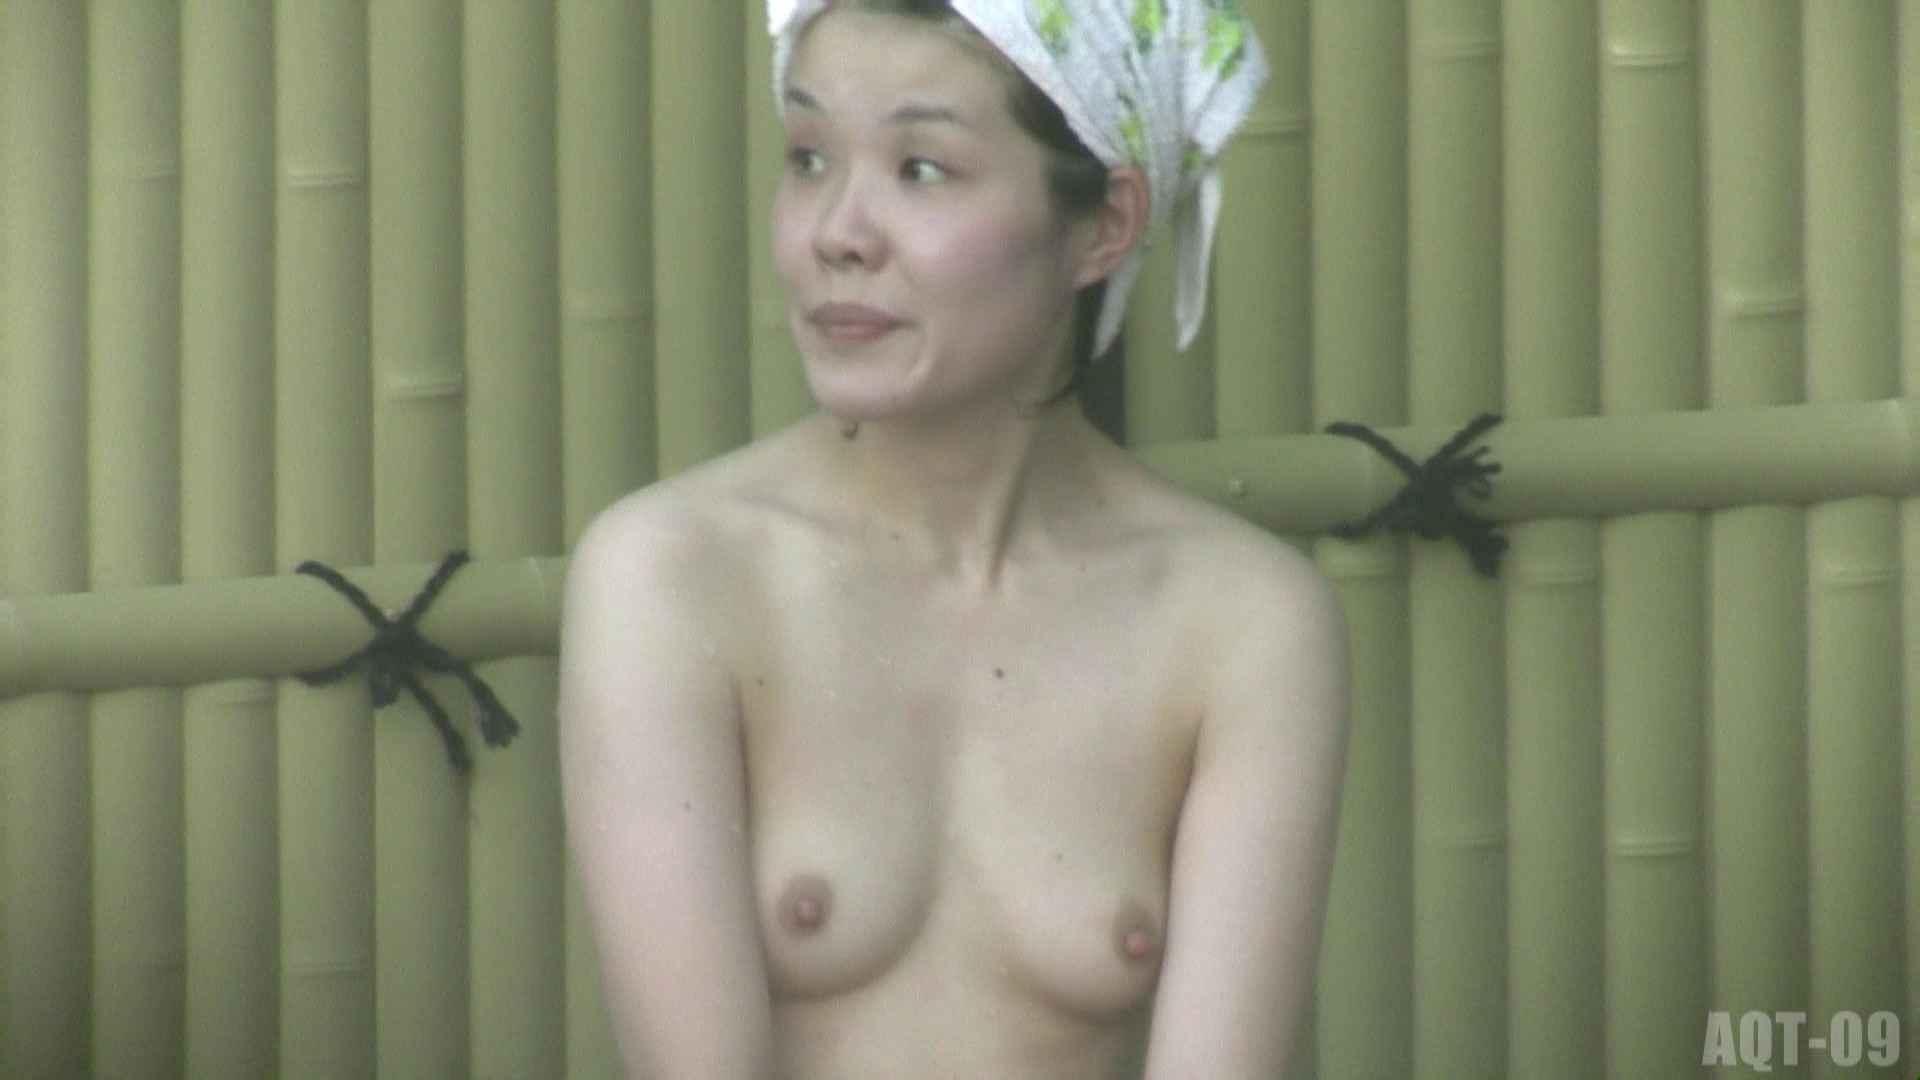 Aquaな露天風呂Vol.786 盗撮師作品  79pic 12